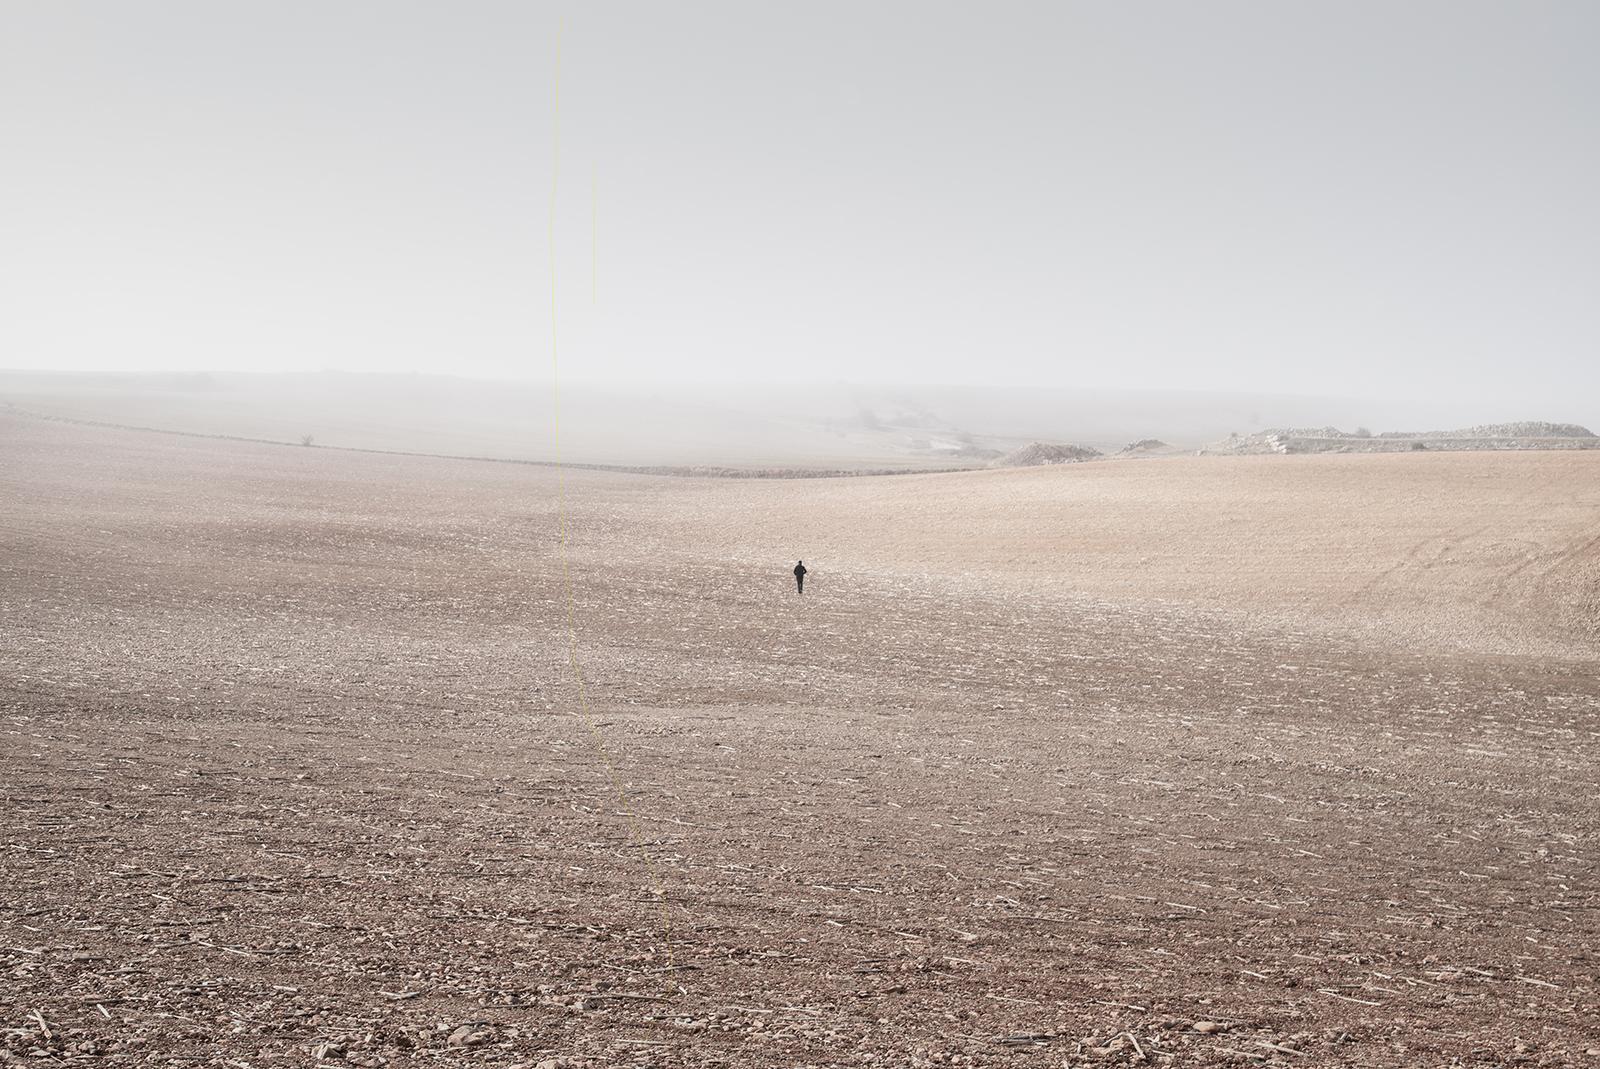 Art and Documentary Photography - Loading The_Last_Man_on_Earth_02.jpg